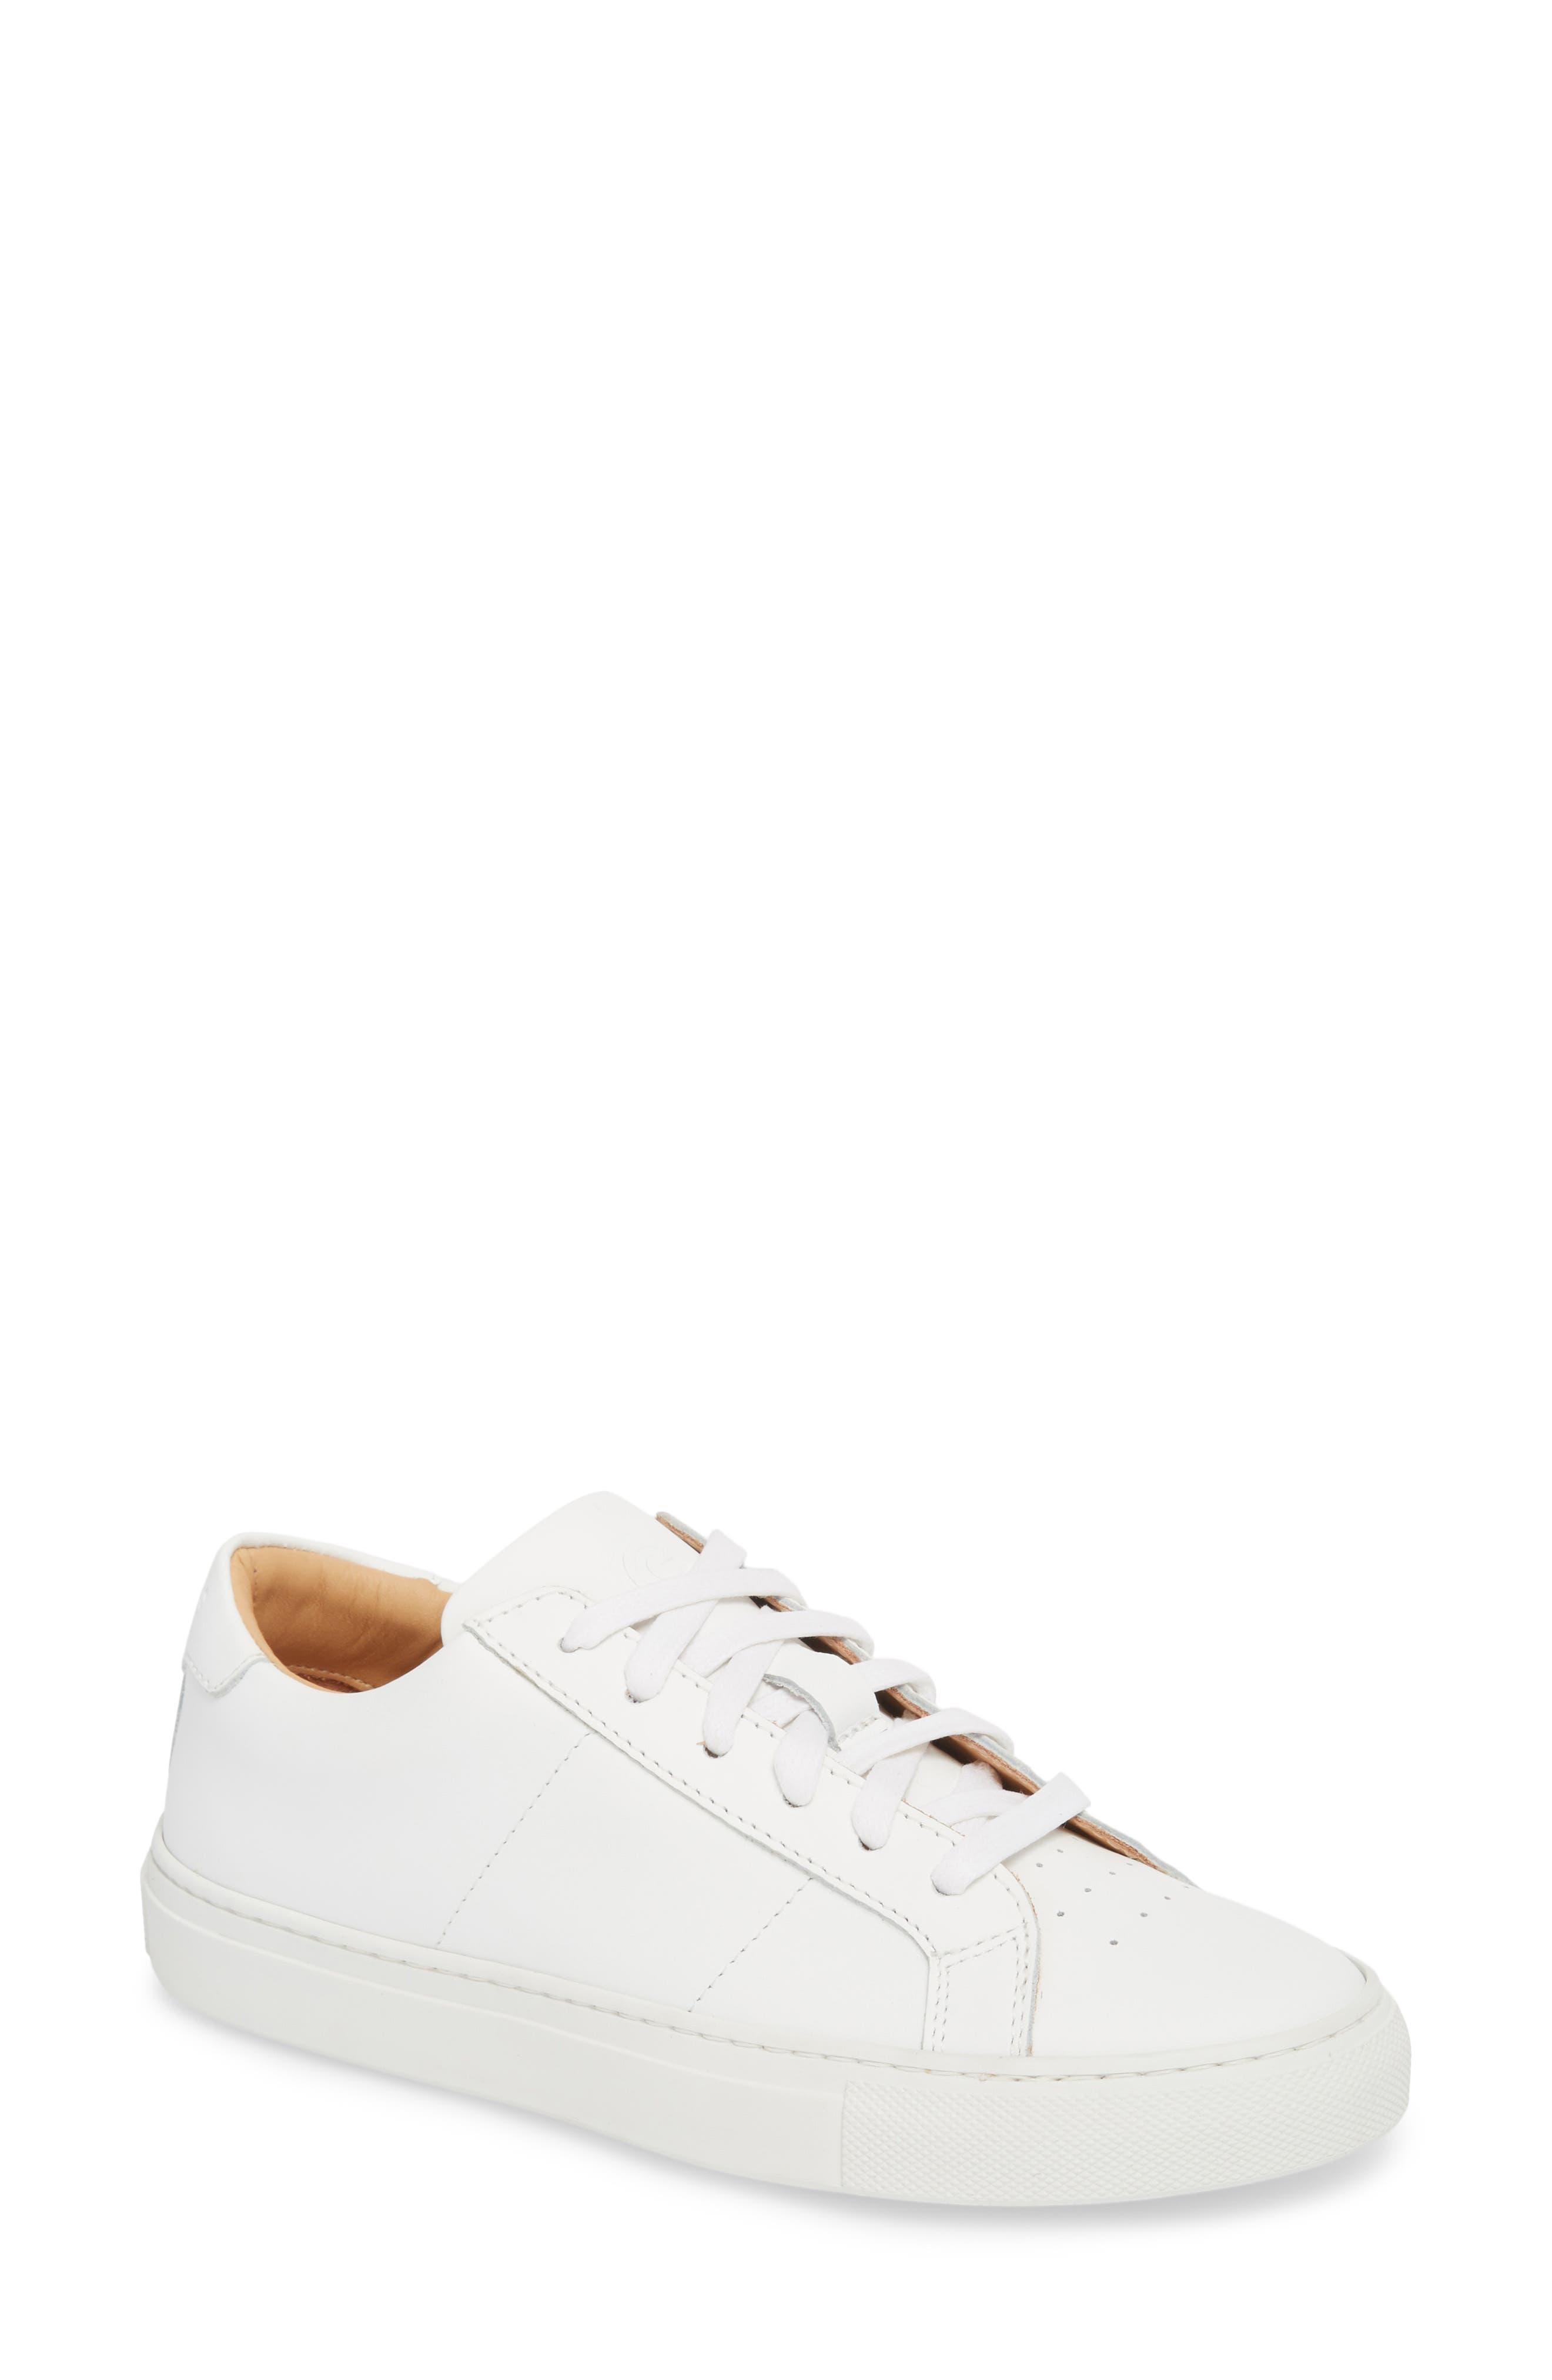 Royale Sneaker,                             Main thumbnail 1, color,